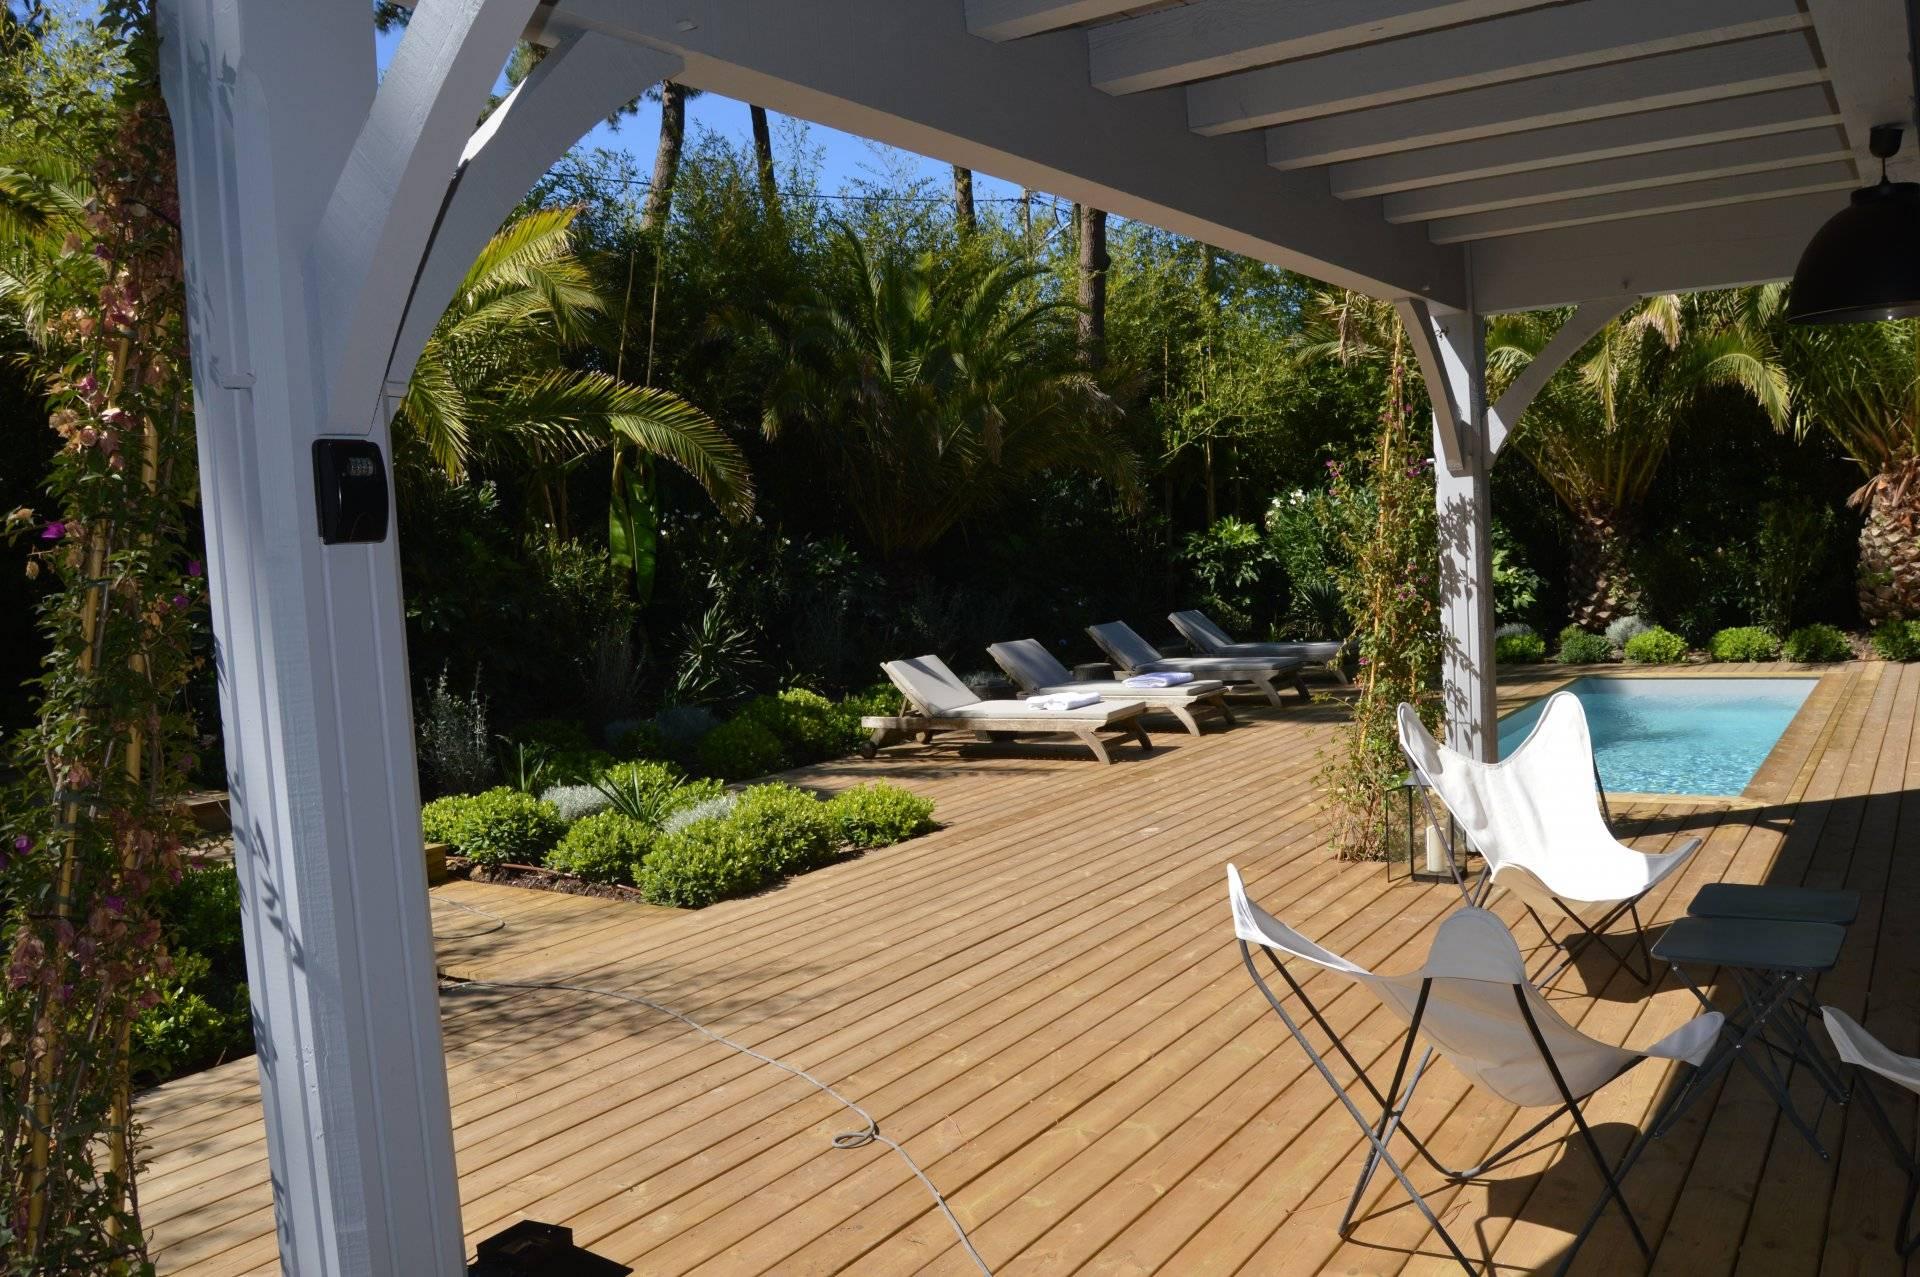 Vente maison bois moderne neuve avec piscine CAP FERRET VILLAGE ...